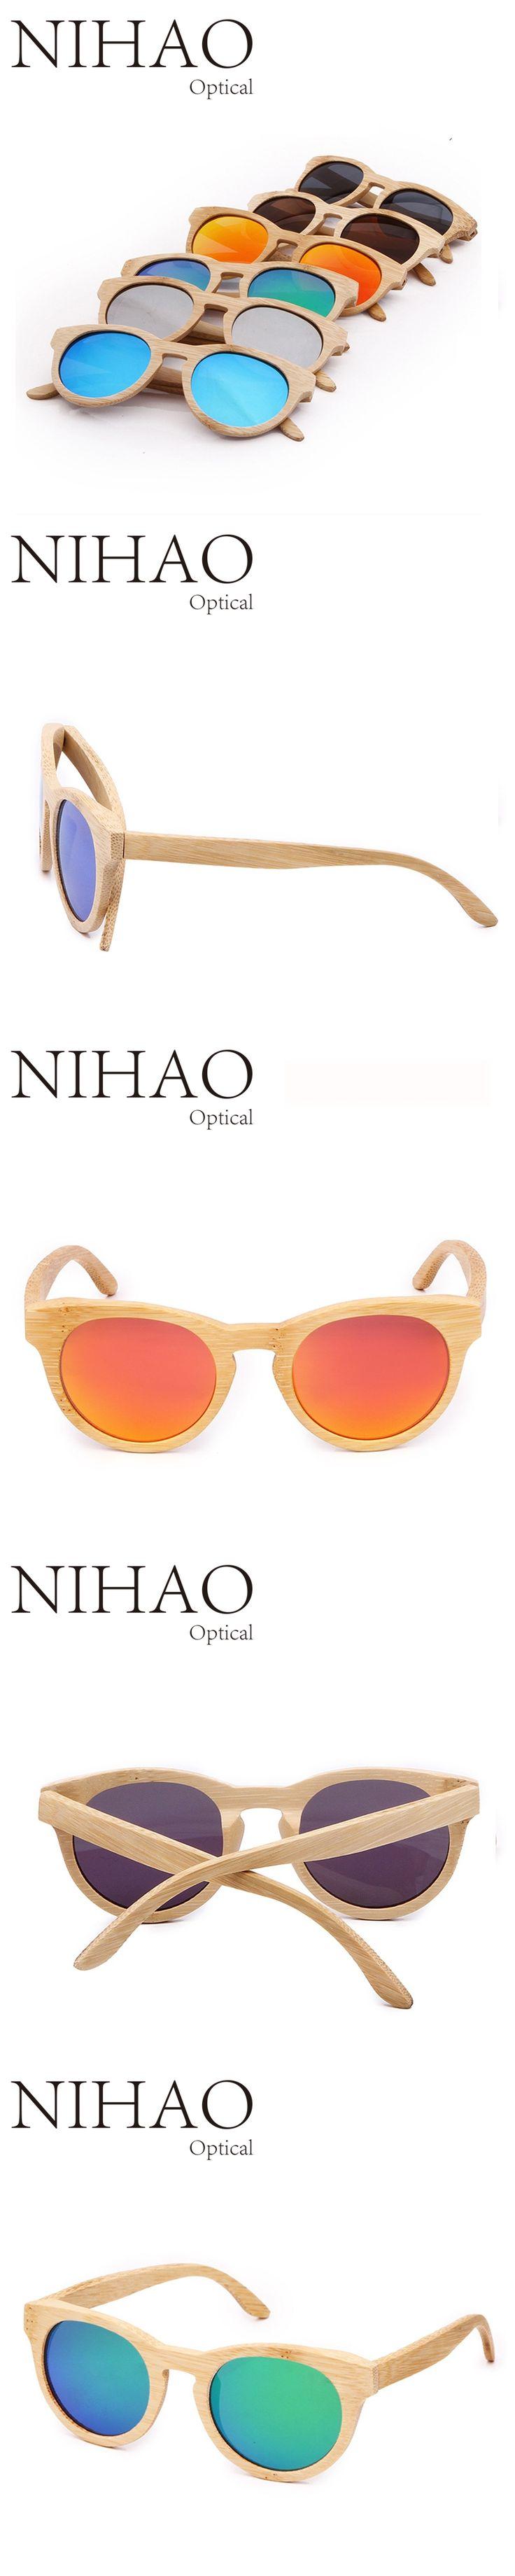 luxury brand sunglasses women 2017 brand glasses Bamboo wood sunglasses steampunk lunette de soleil femme wooden sunglasses